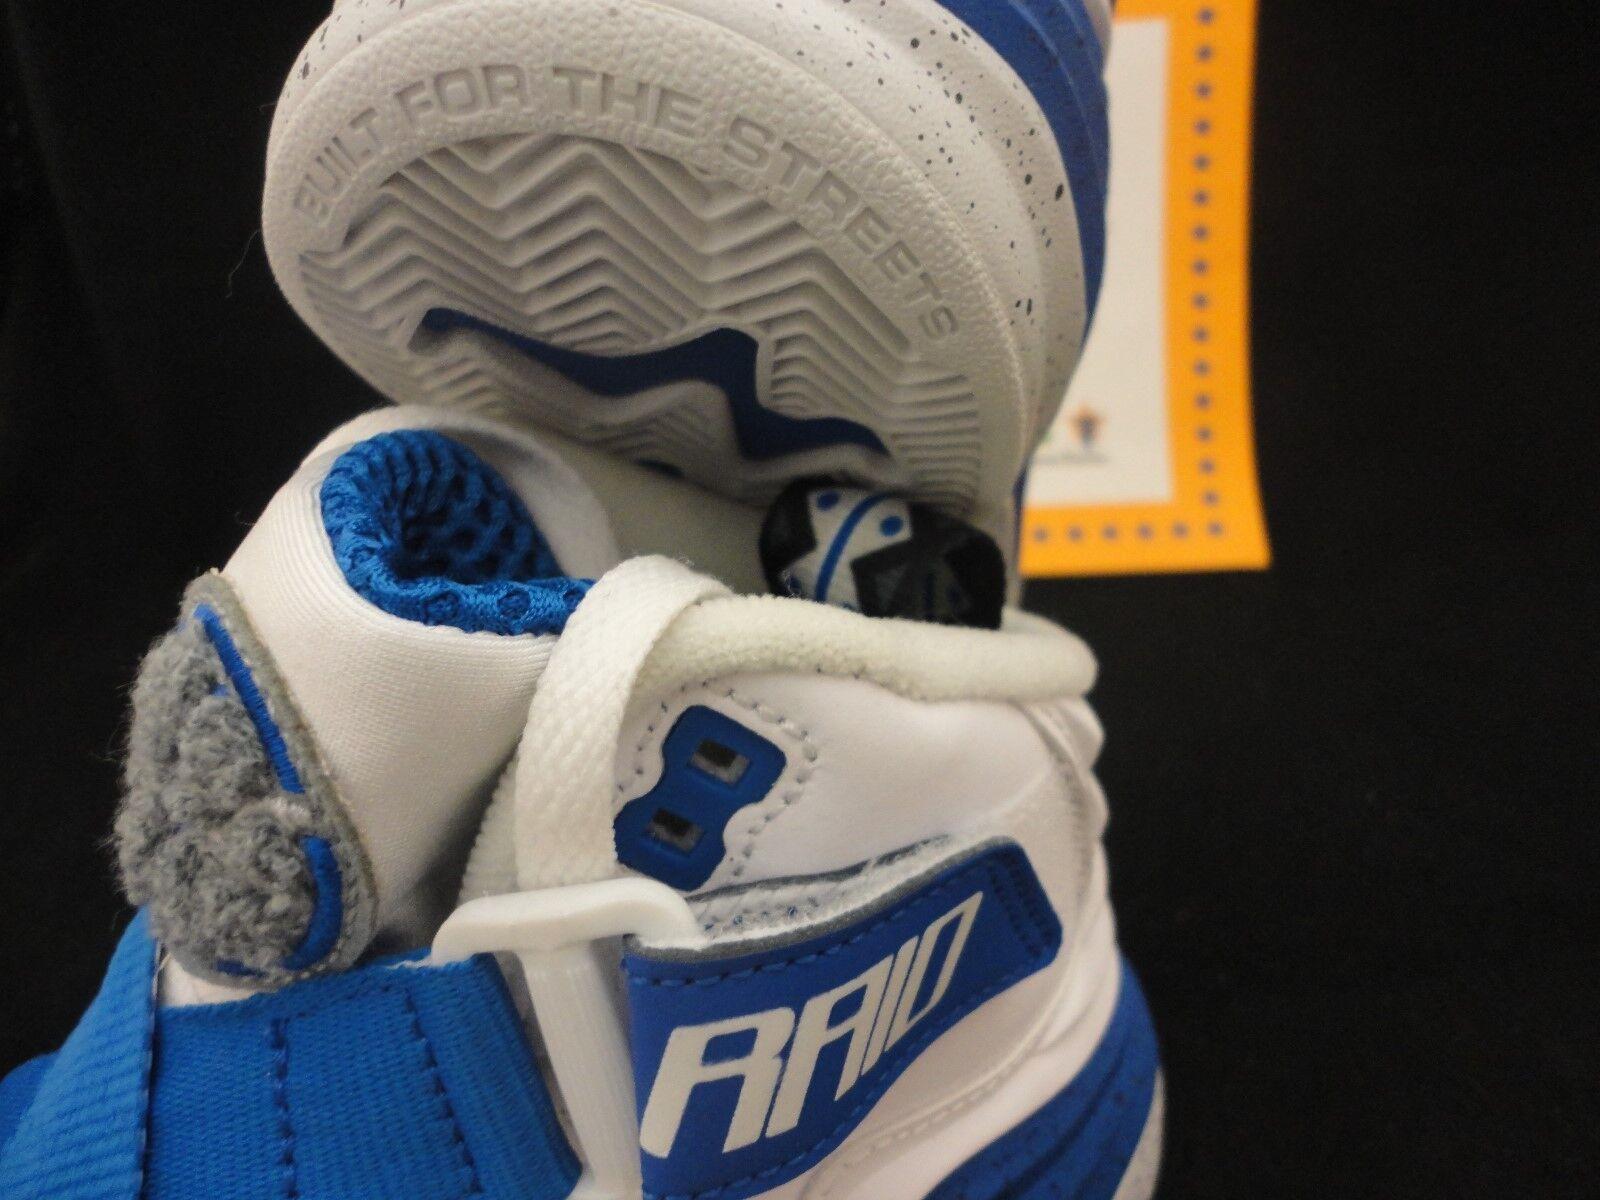 Nike Lunar Raid, White / Game Royal / Pure Platinum, Retail 145, Size 8